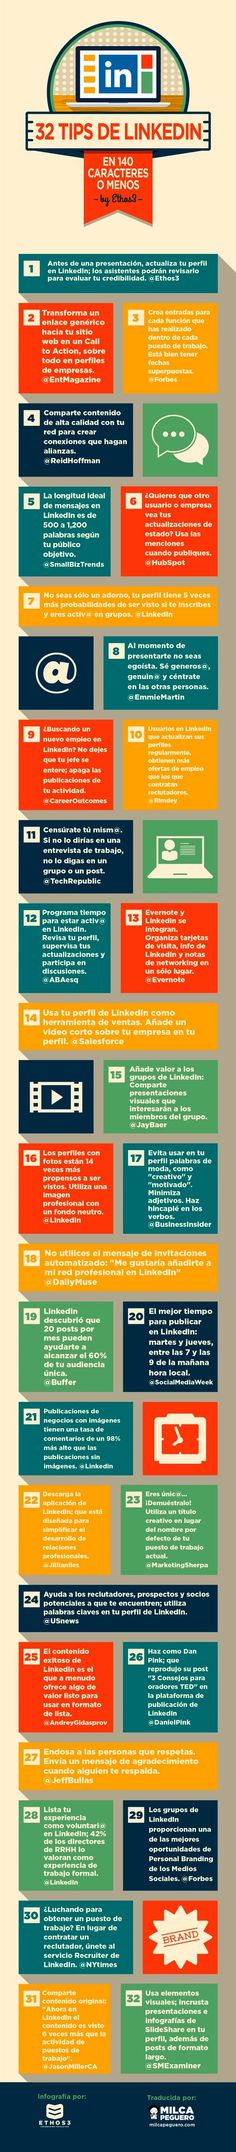 32 tips para LinkedIn [Ethos3, traducción de Milca Peguero]